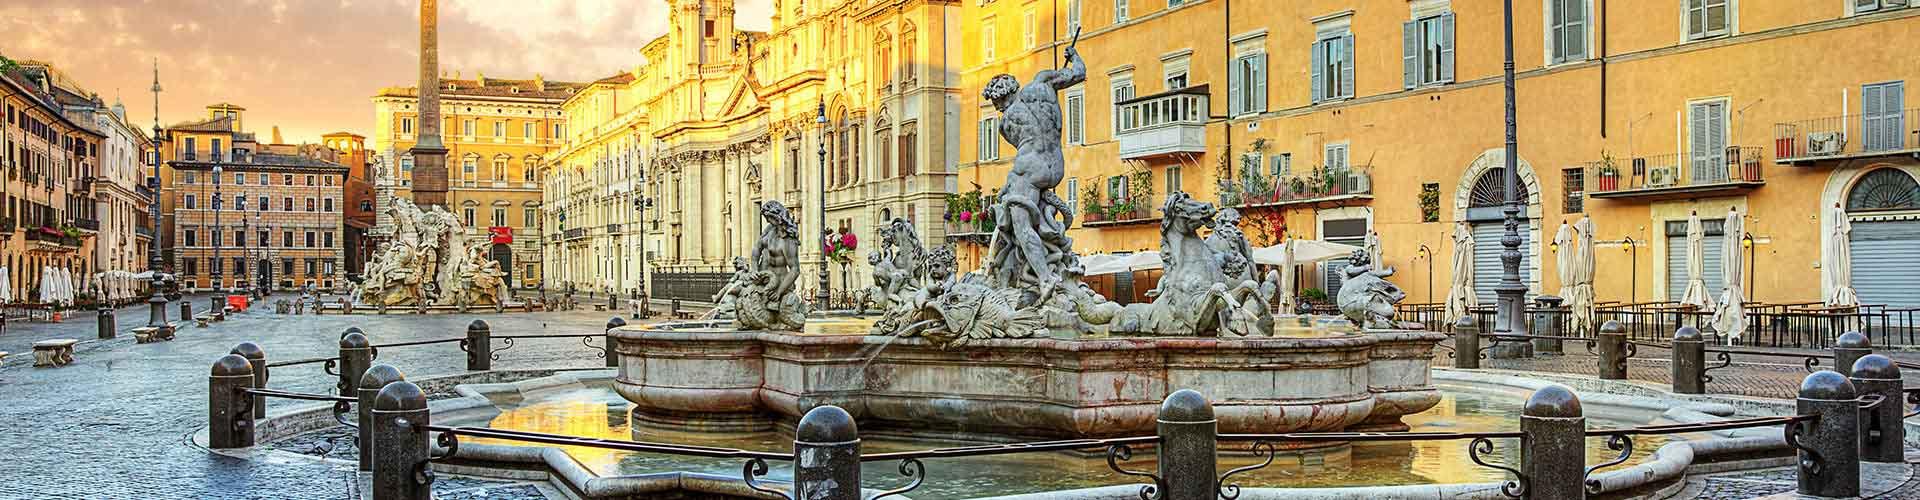 Roma - Albergues Juveniles cerca a Piazza Navona. Mapas de Roma, Fotos y Comentarios para cada Albergue Juvenil en Roma.